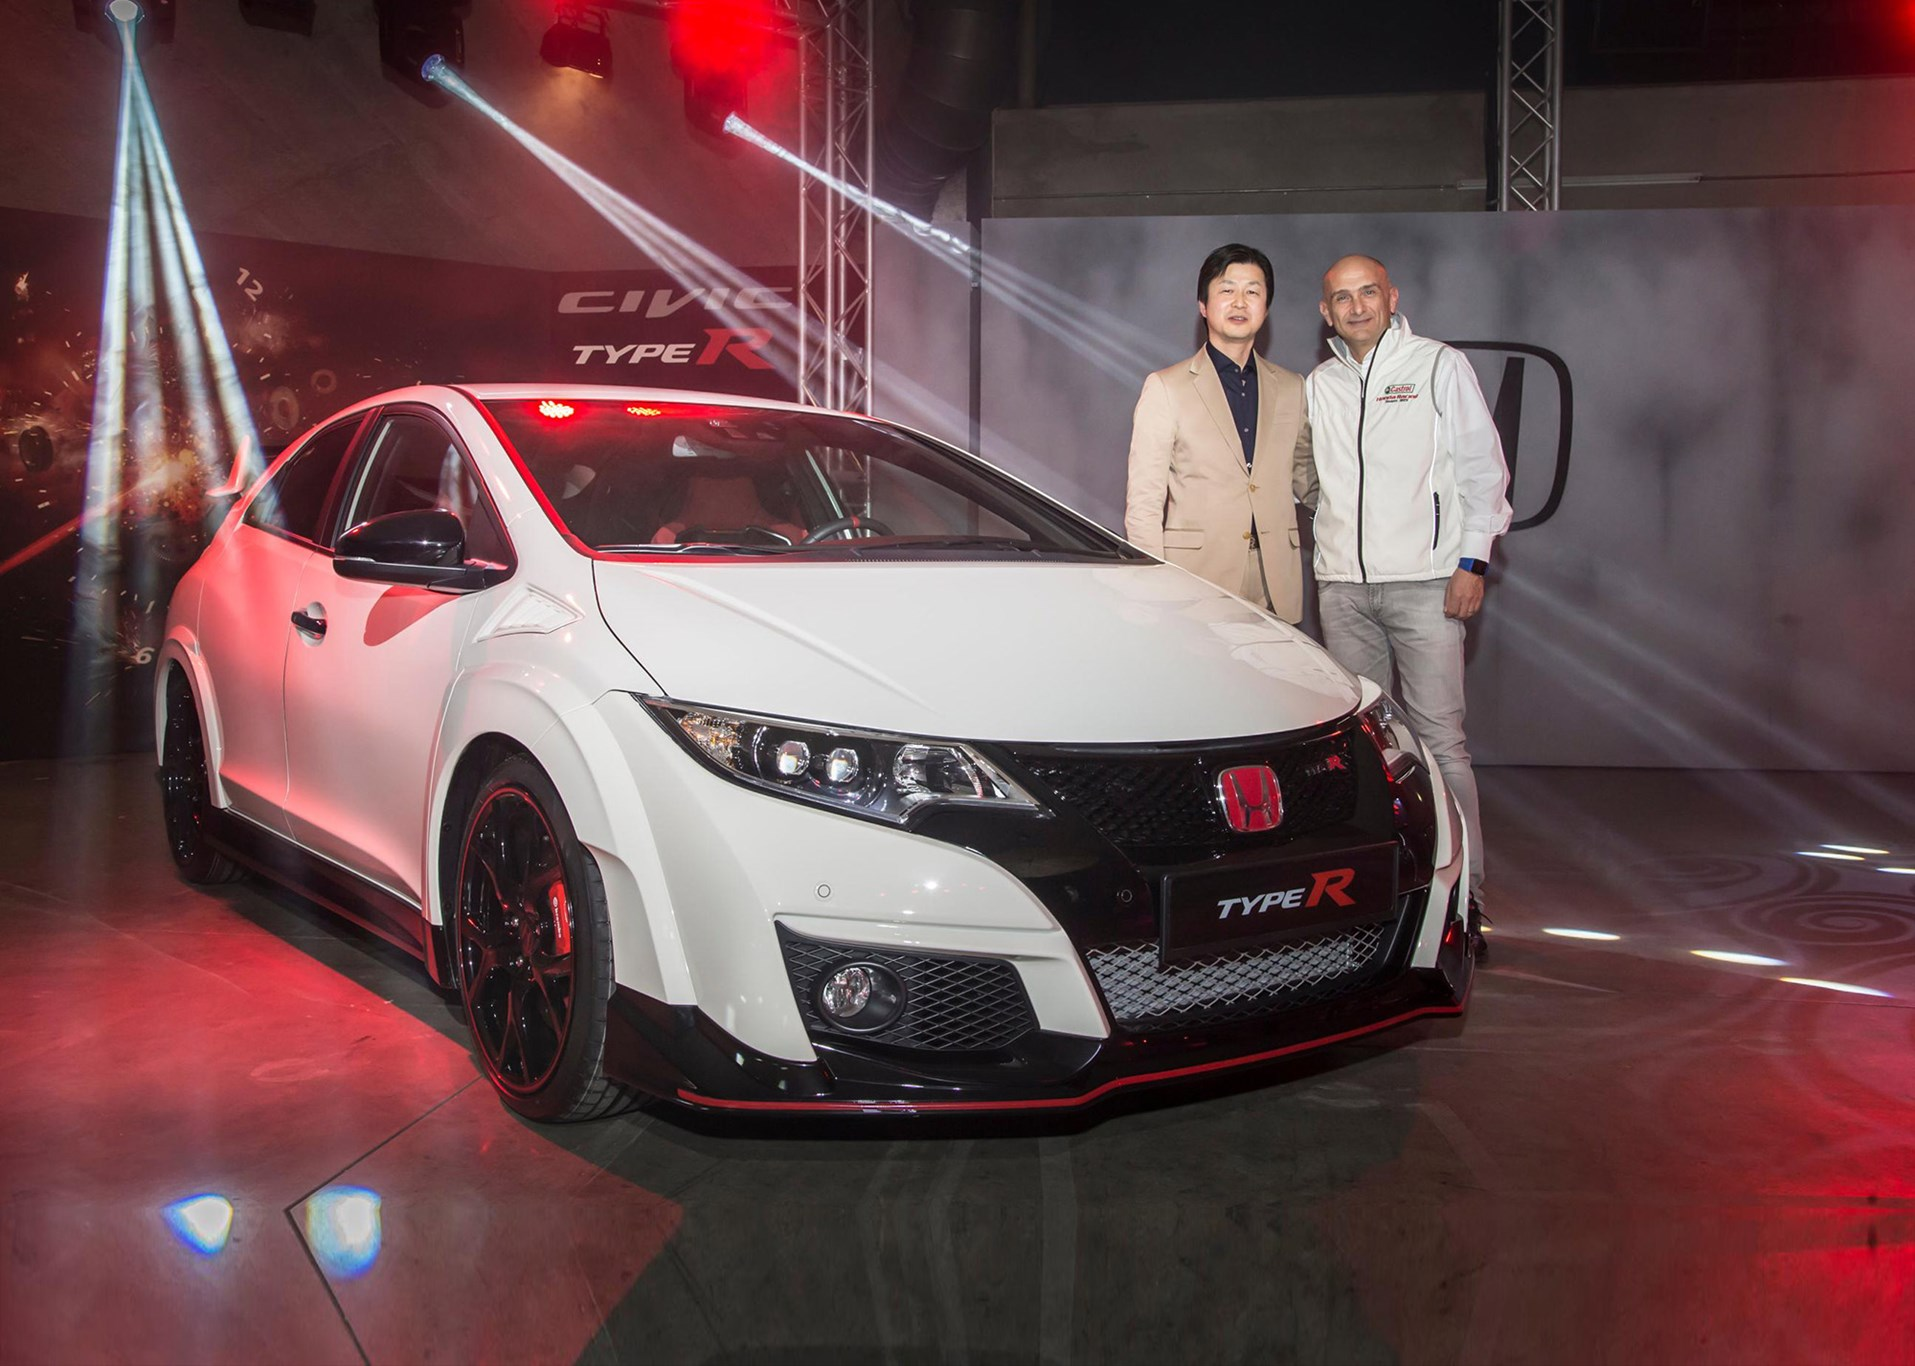 Honda civic type r world debut at geneva 2015